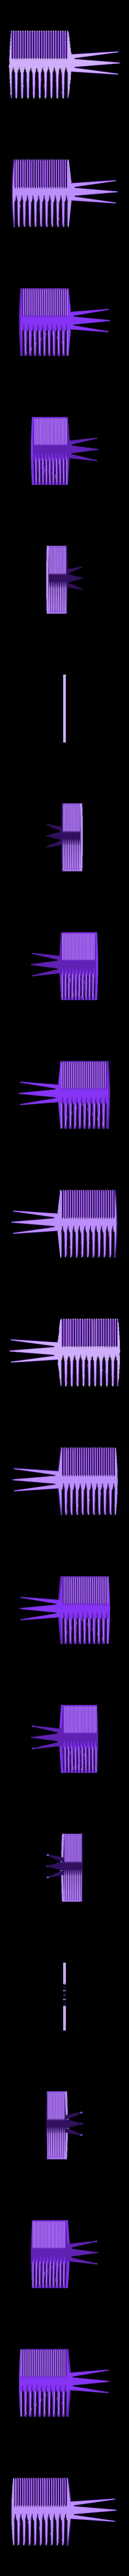 grzebien4.stl Download free STL file Perfect Comb • 3D print template, Protonik